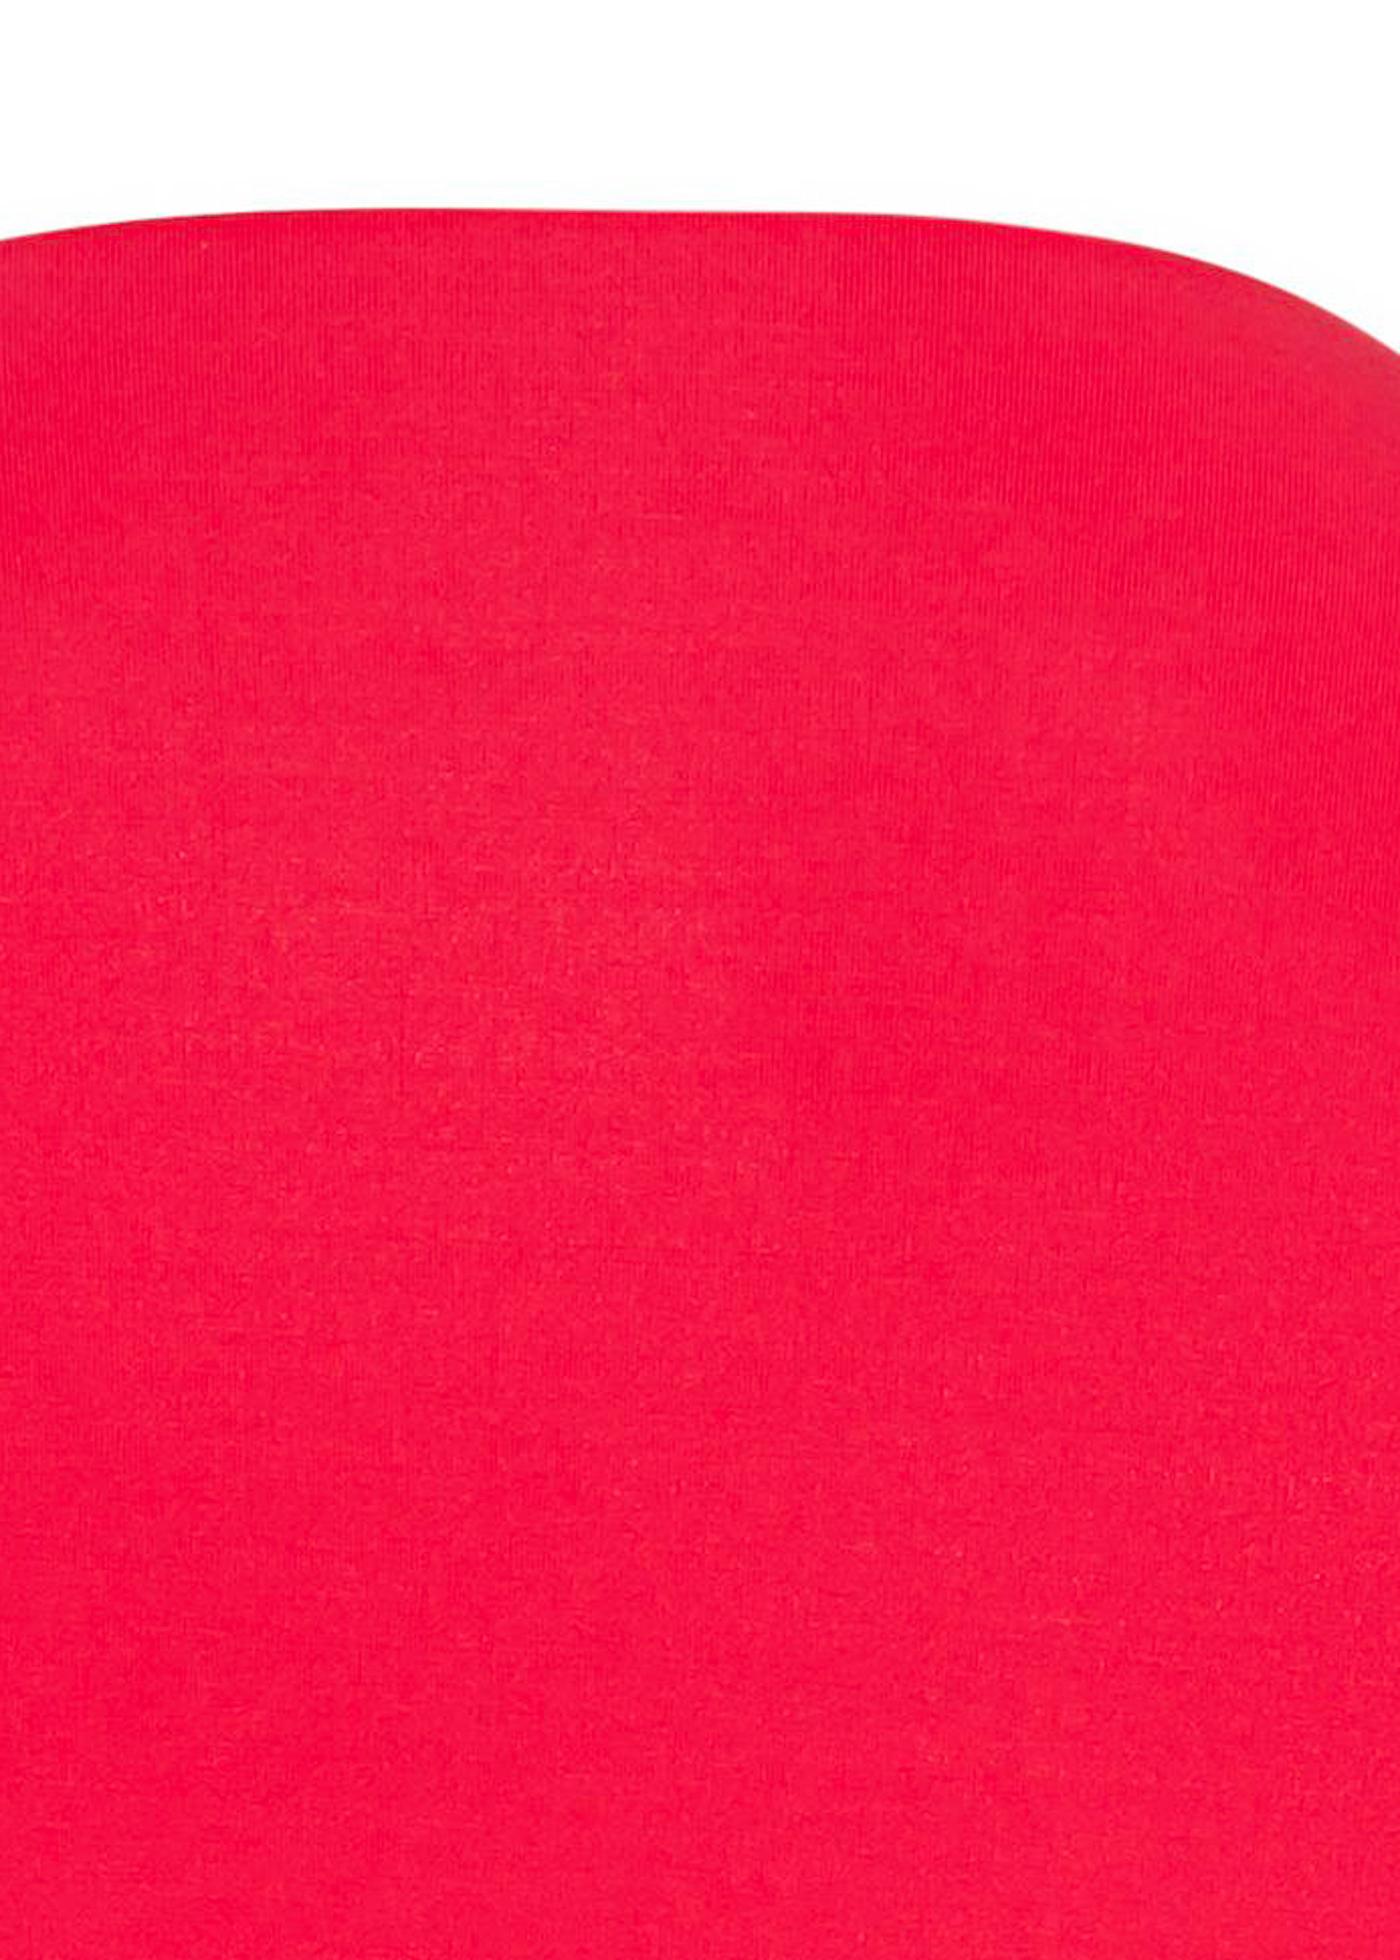 Aurora Pure Shirt image number 3